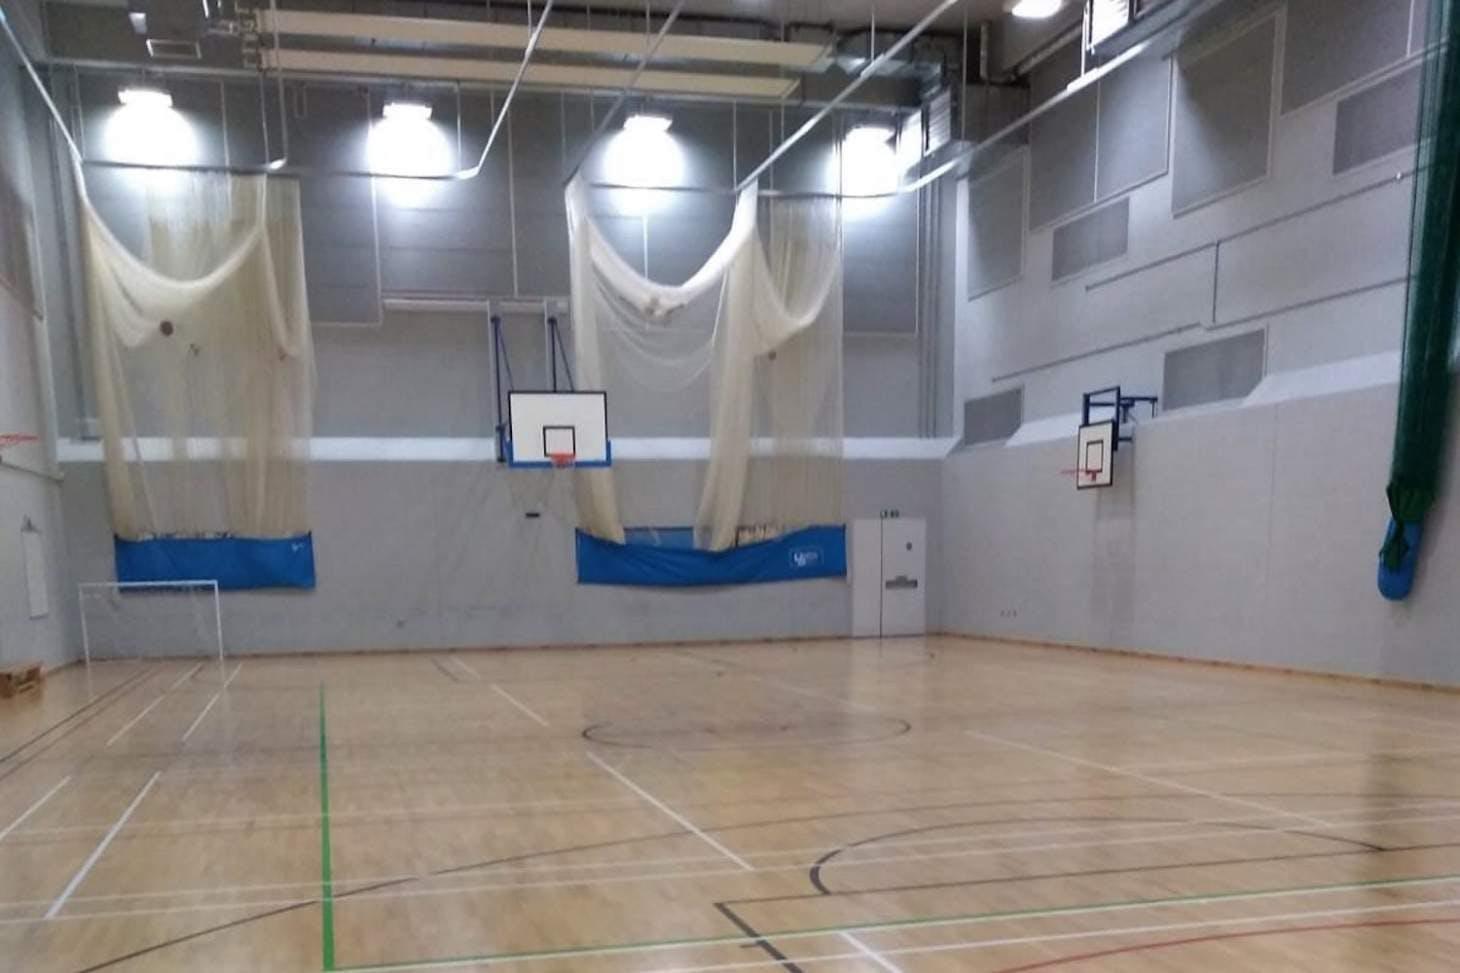 Kensington Aldridge Academy Court   Sports hall volleyball court